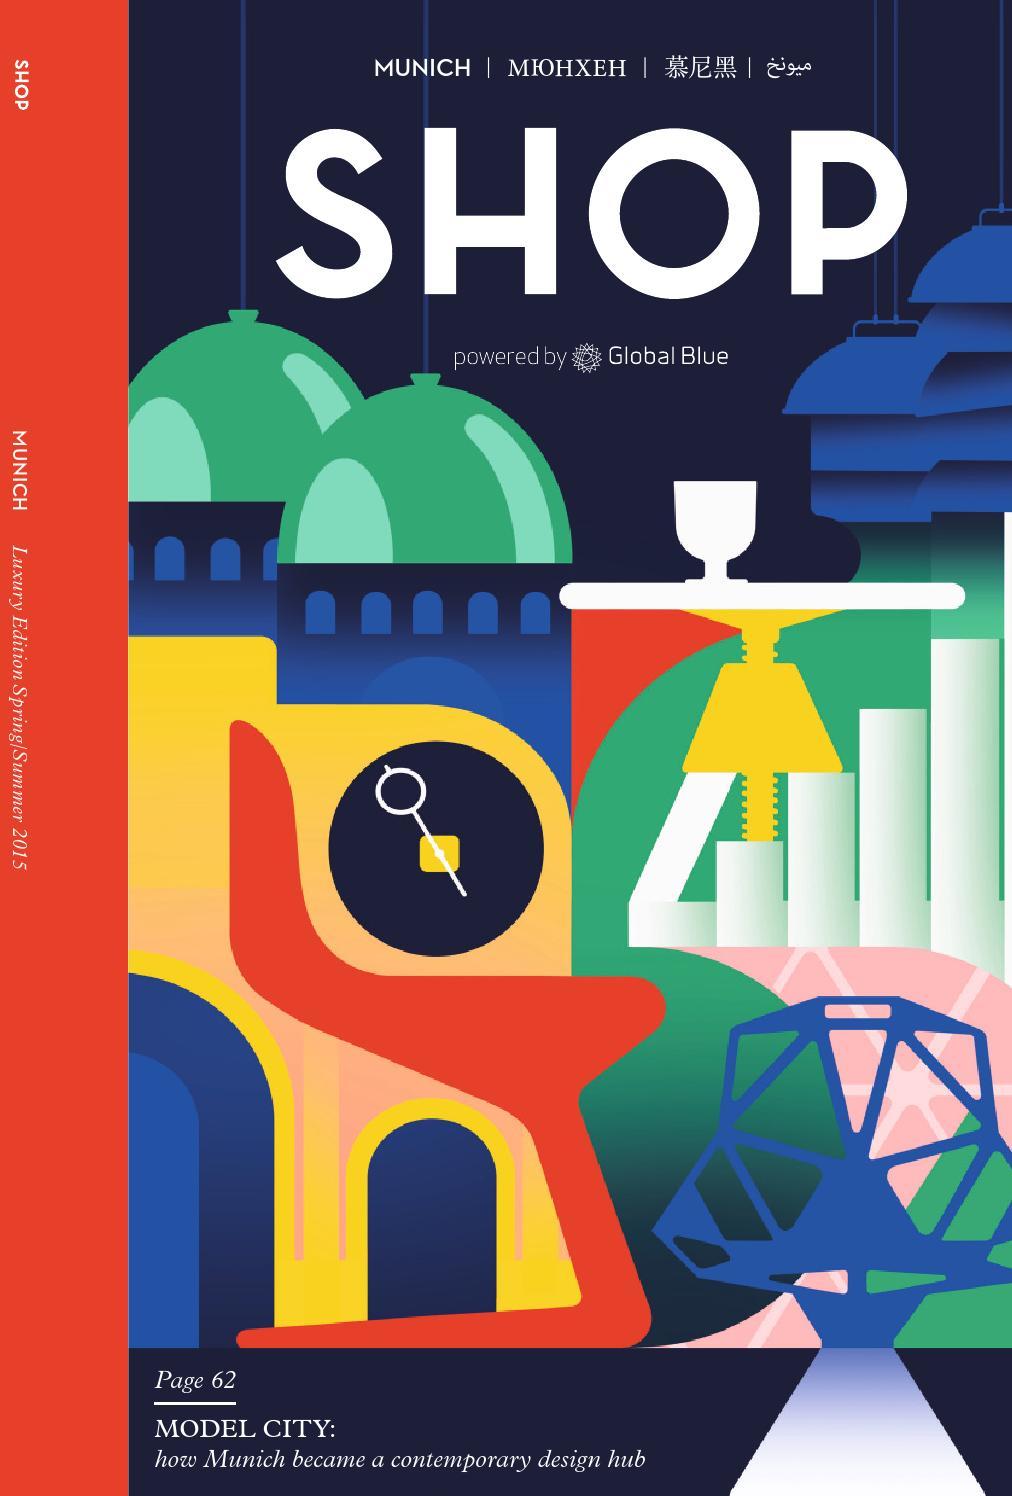 SHOP Munich SS15 by SHOP | Global Blue - issuu